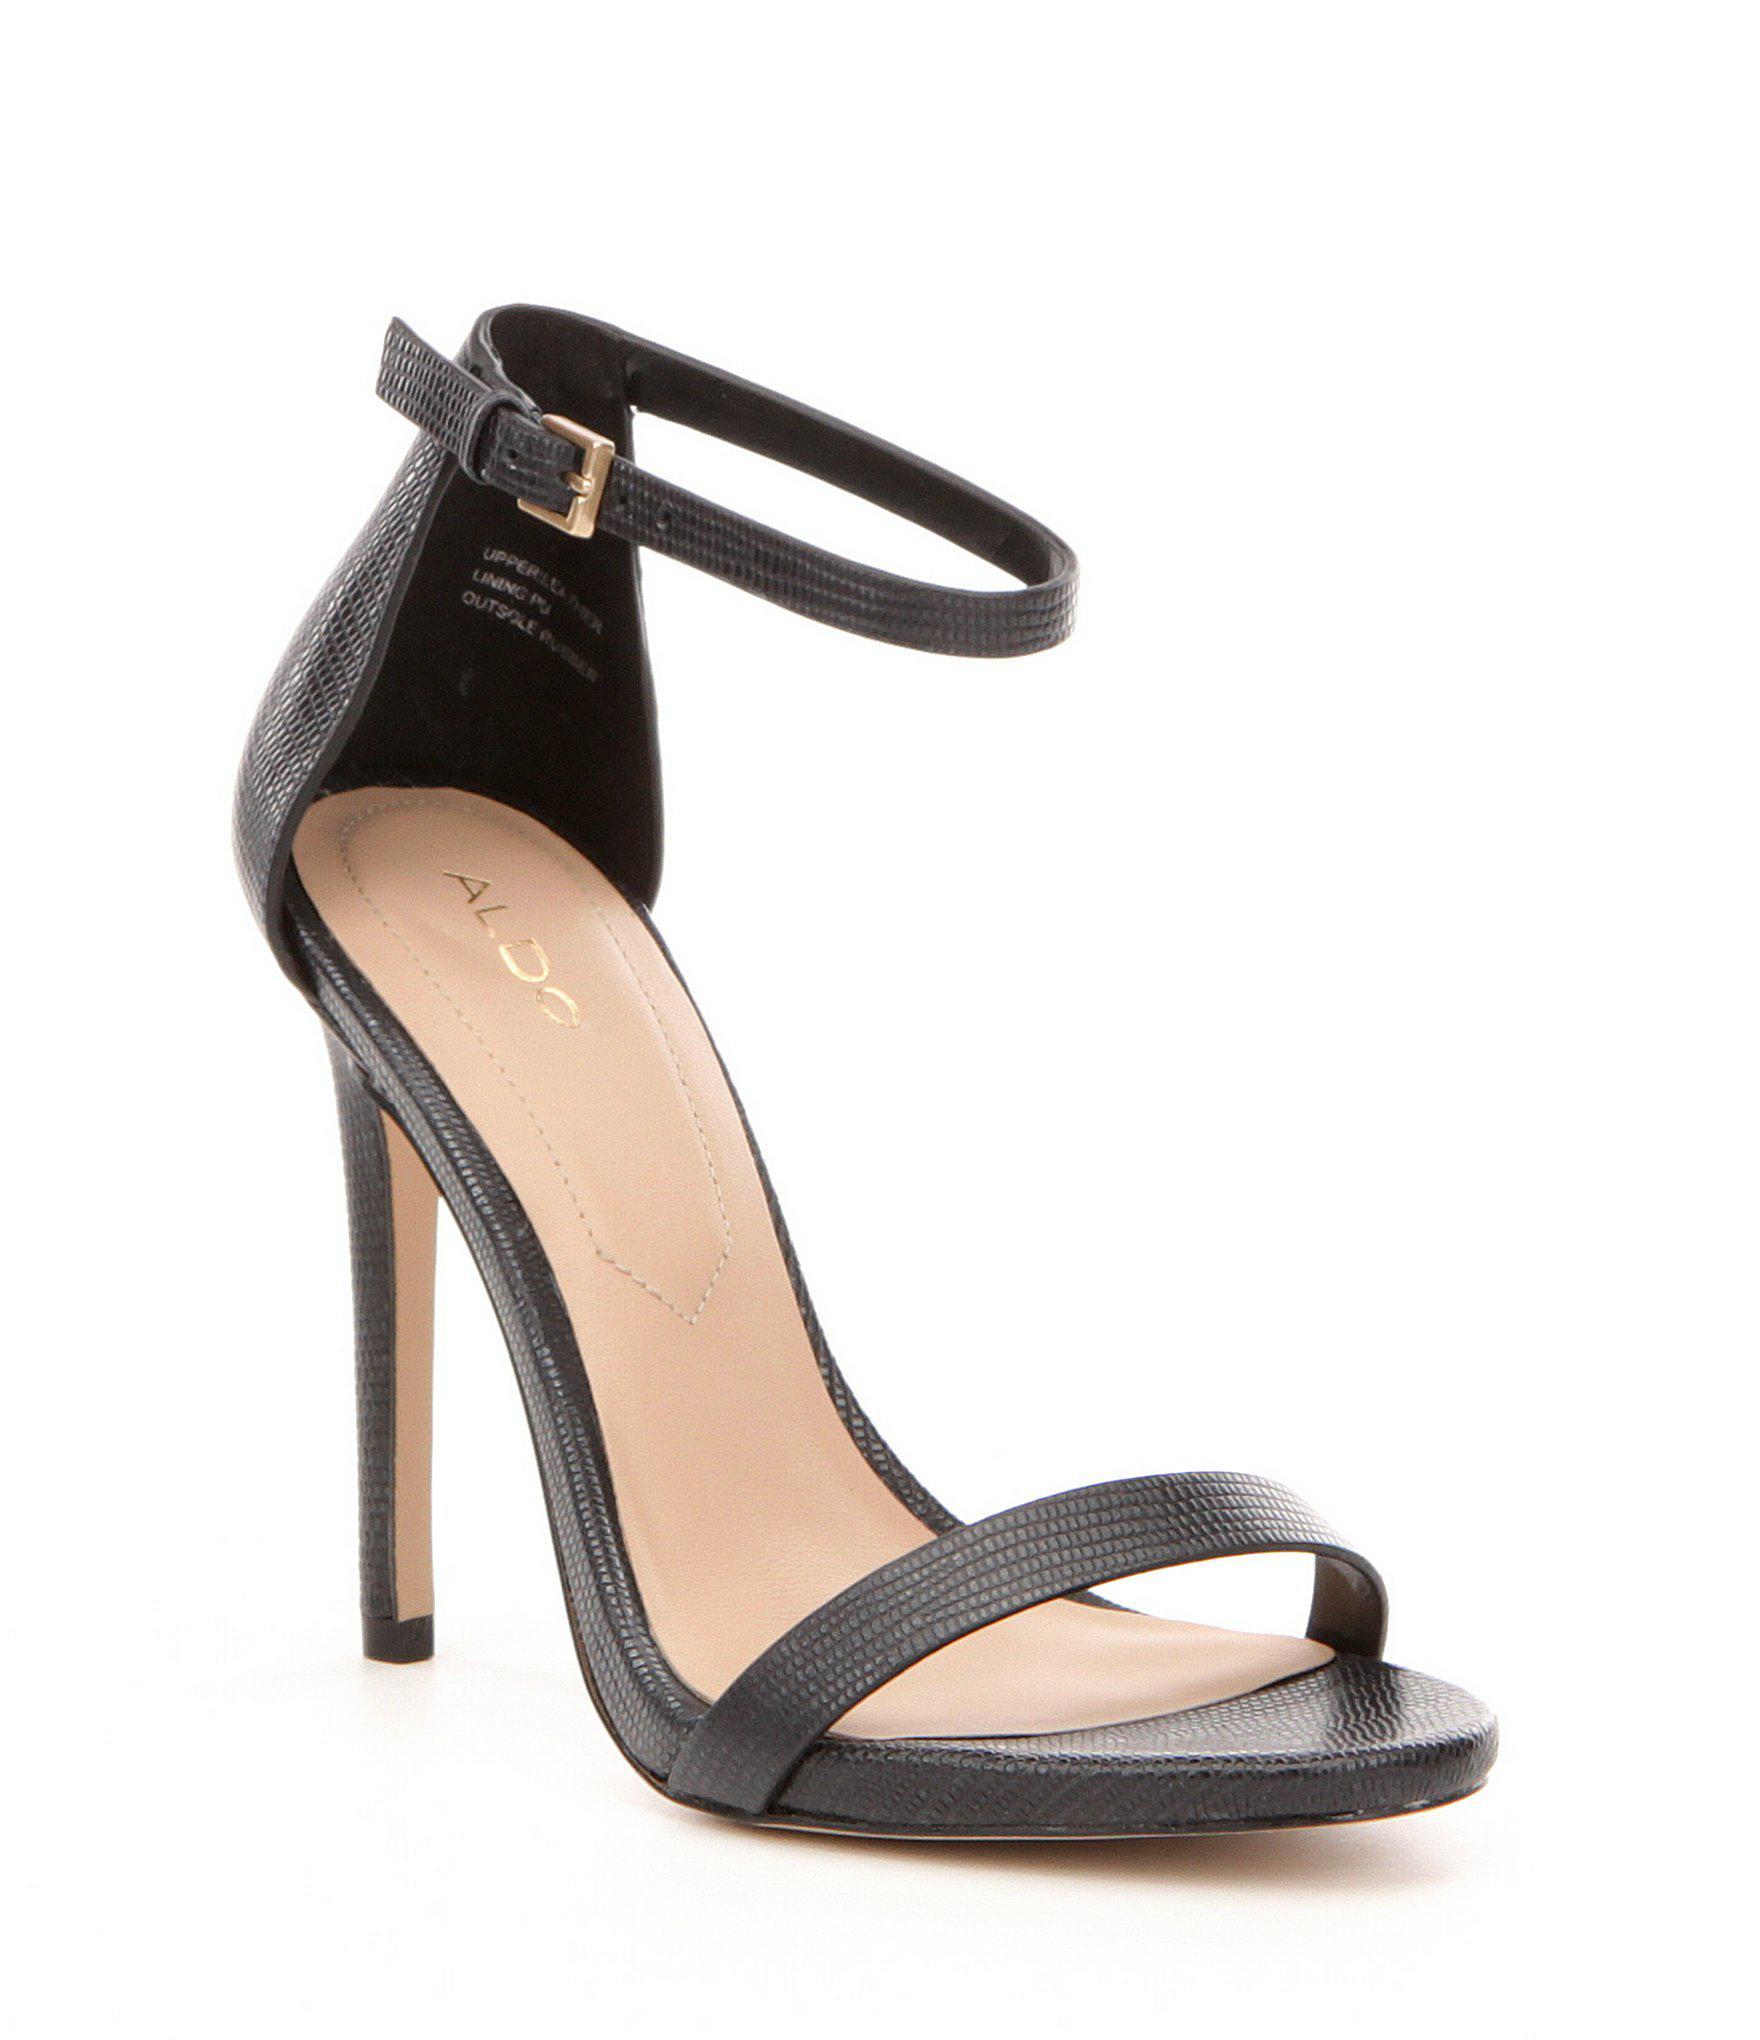 9b906cb484b Lyst - ALDO Caraa Ankle-strap Leather Dress Sandals in Black